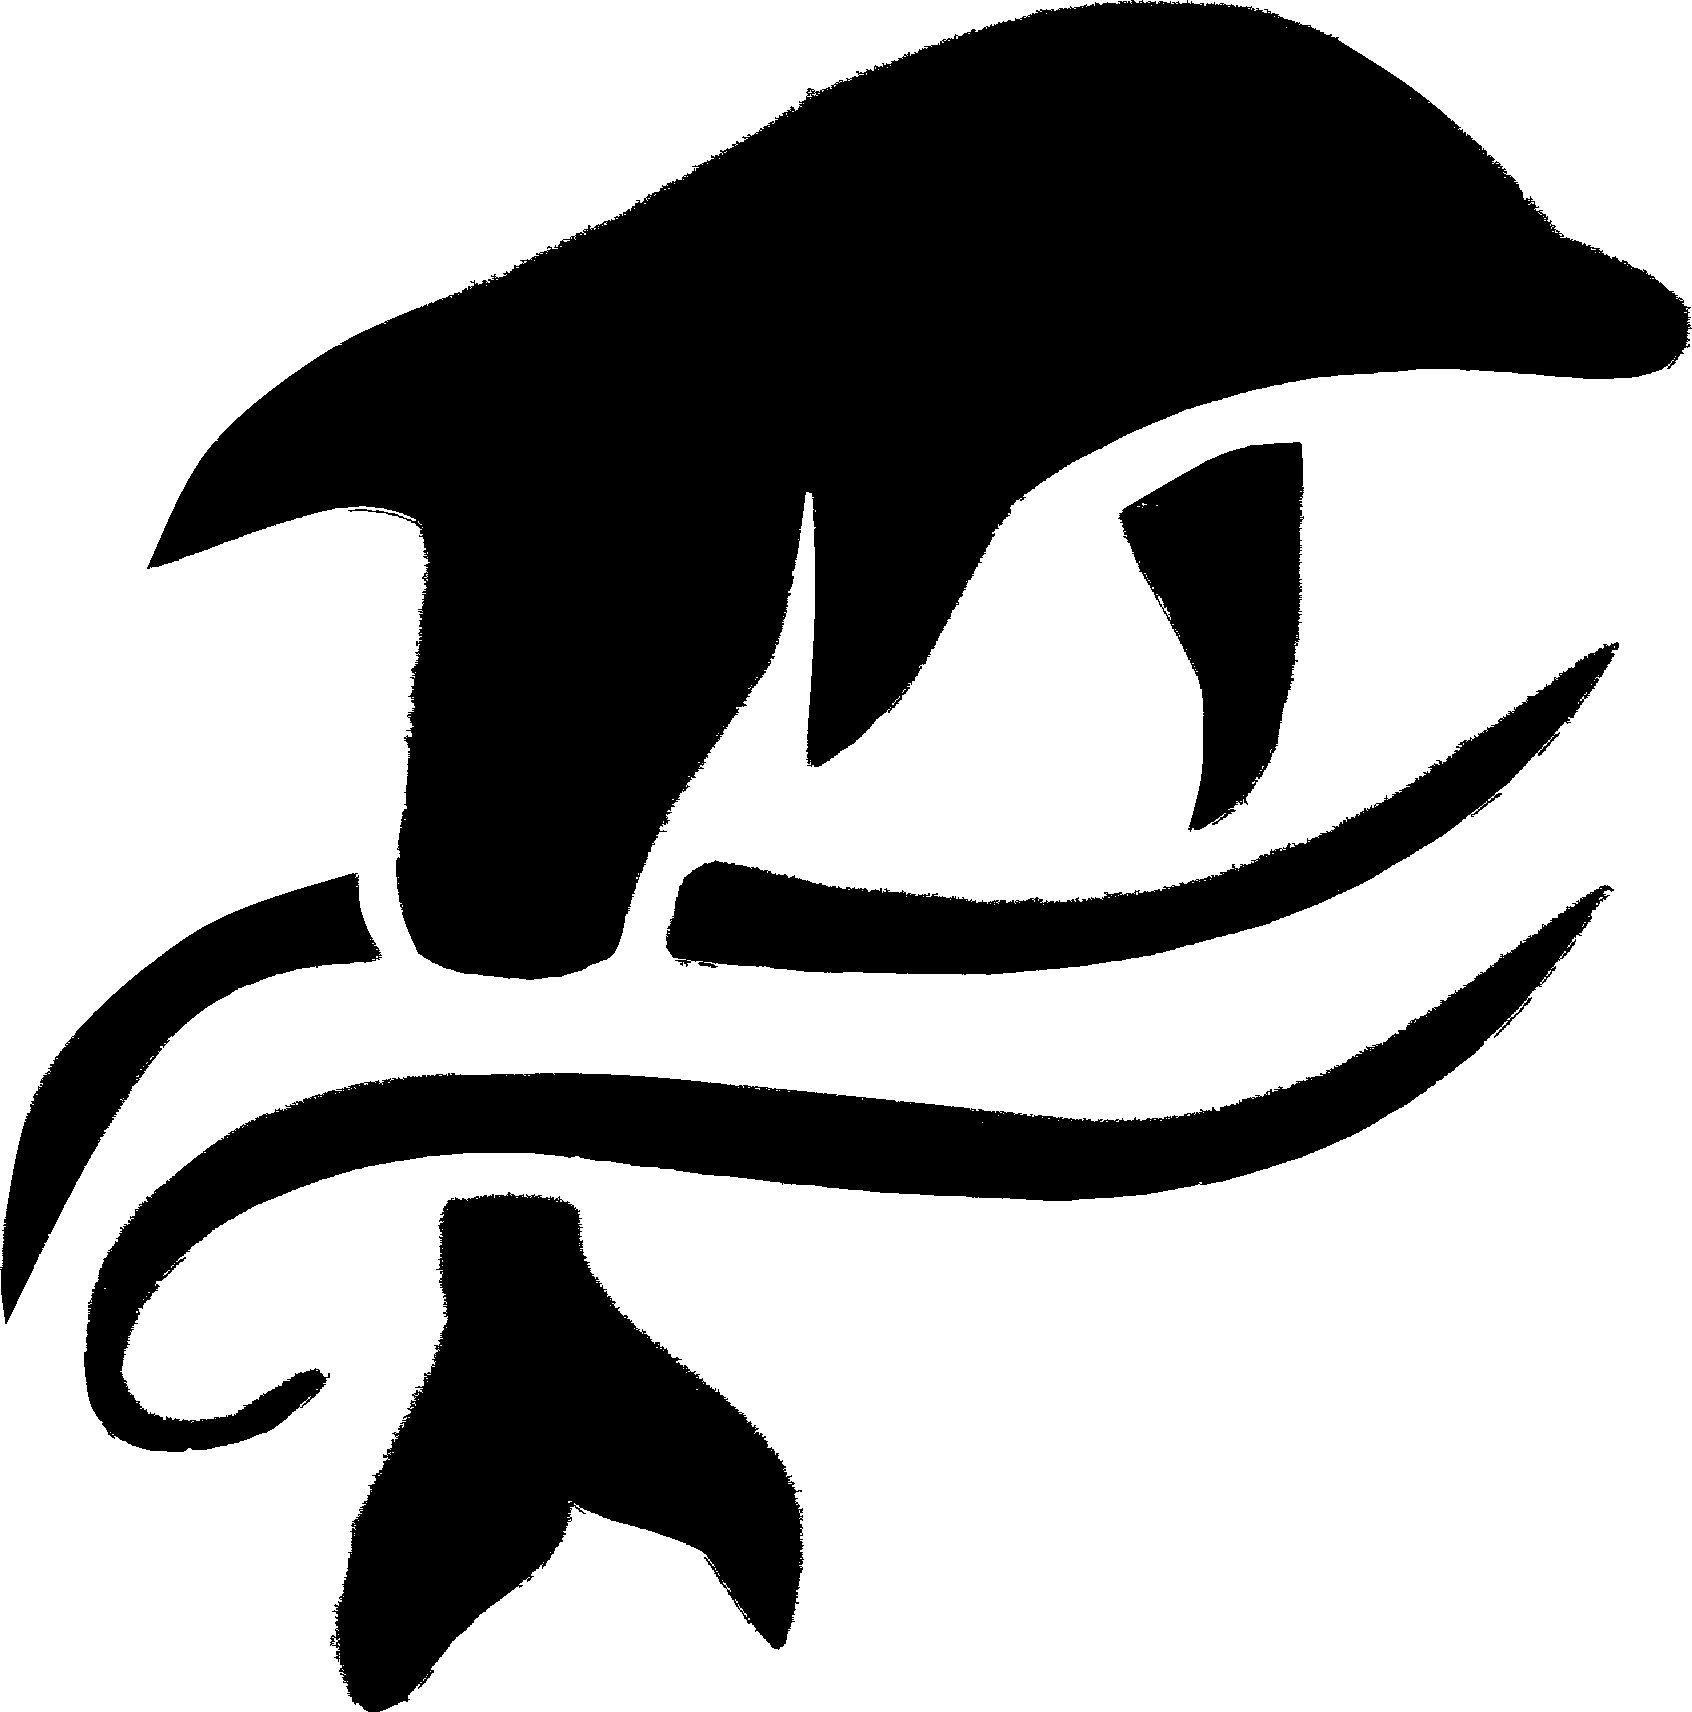 Stencil Dolphin on Wave | vystrihovanky | Pinterest | Stenciling ...